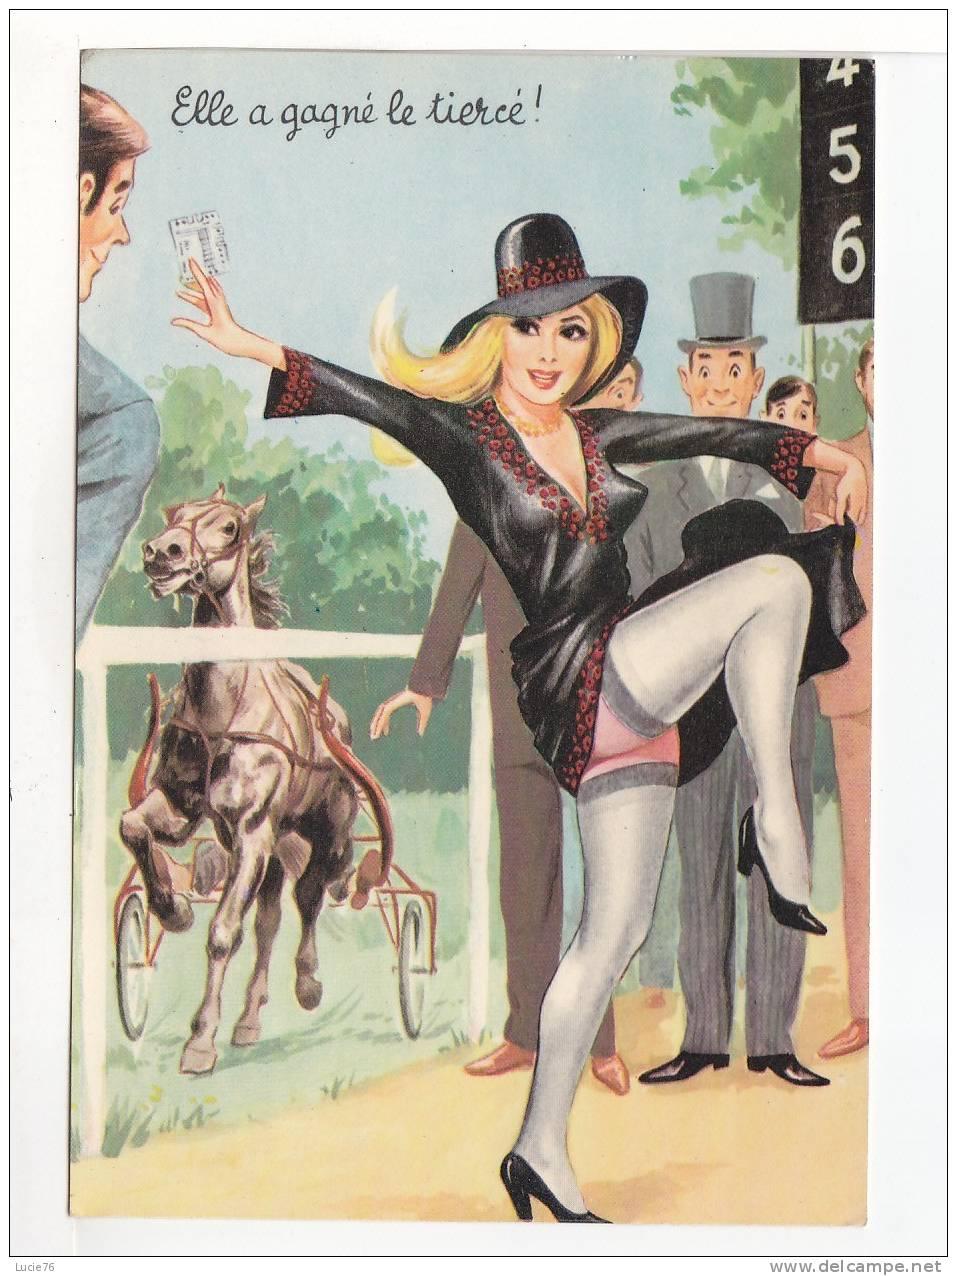 CARTE HUMORISTIQUE  PHOTOCHROM -  Elle A Gagné Le  TIERCE  -   N°  50347 - Humour